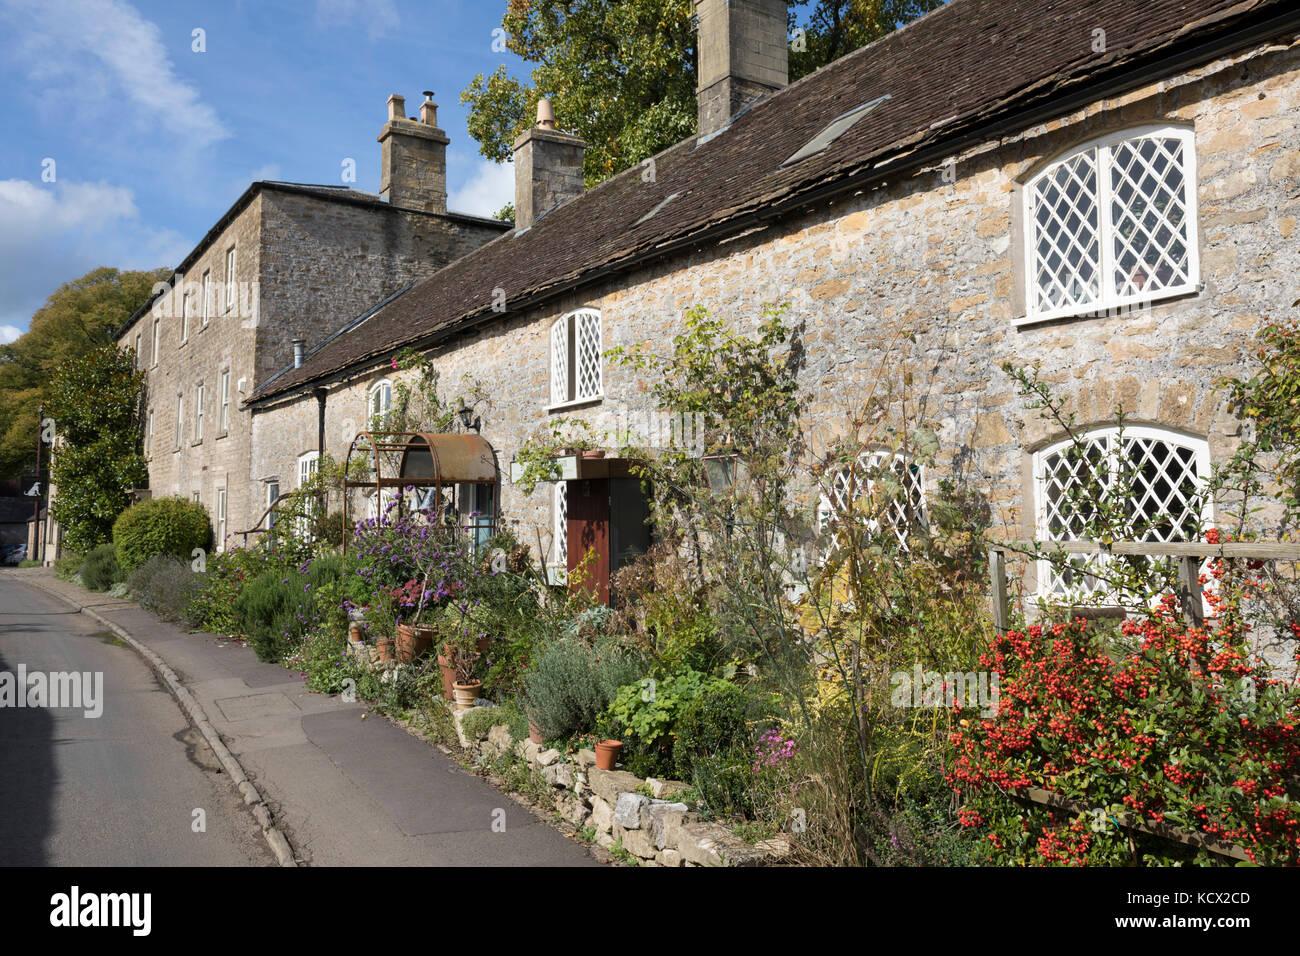 Line of traditional stone cottages, Mells, Somerset, England, United Kingdom, Europe - Stock Image